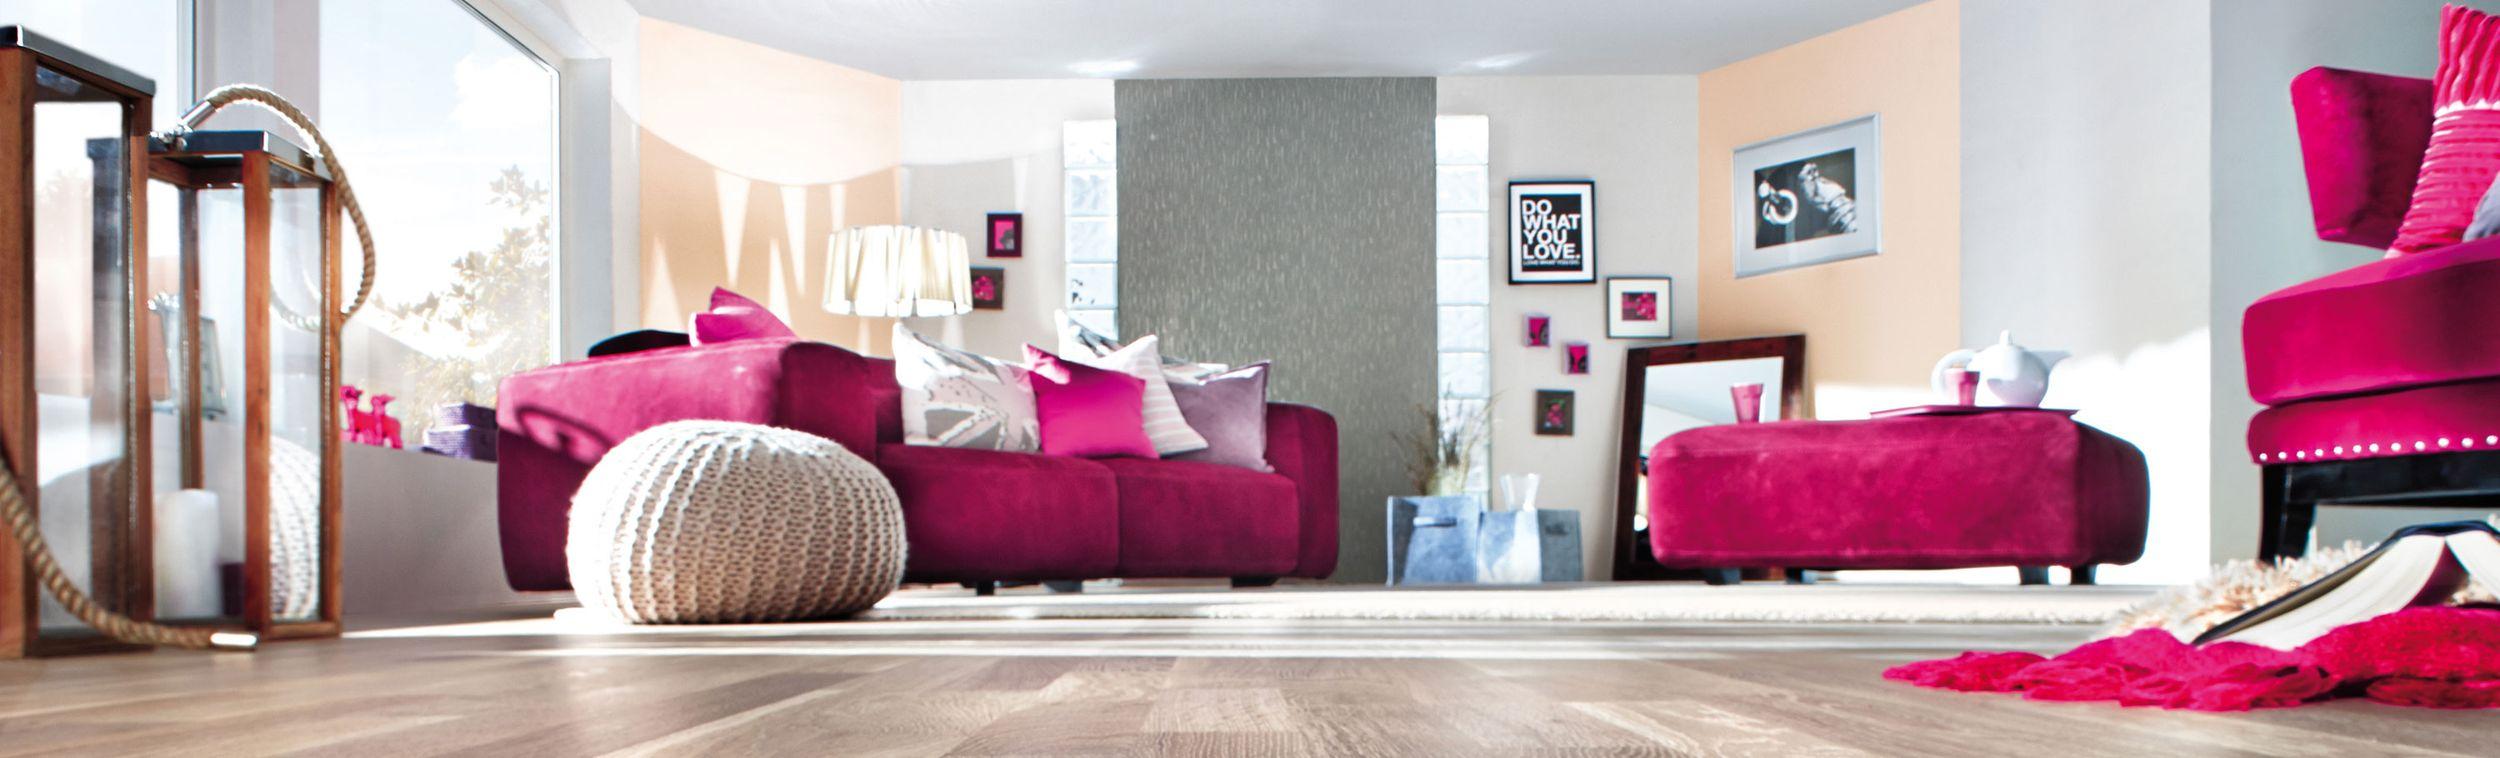 lfd gera gmbh home. Black Bedroom Furniture Sets. Home Design Ideas